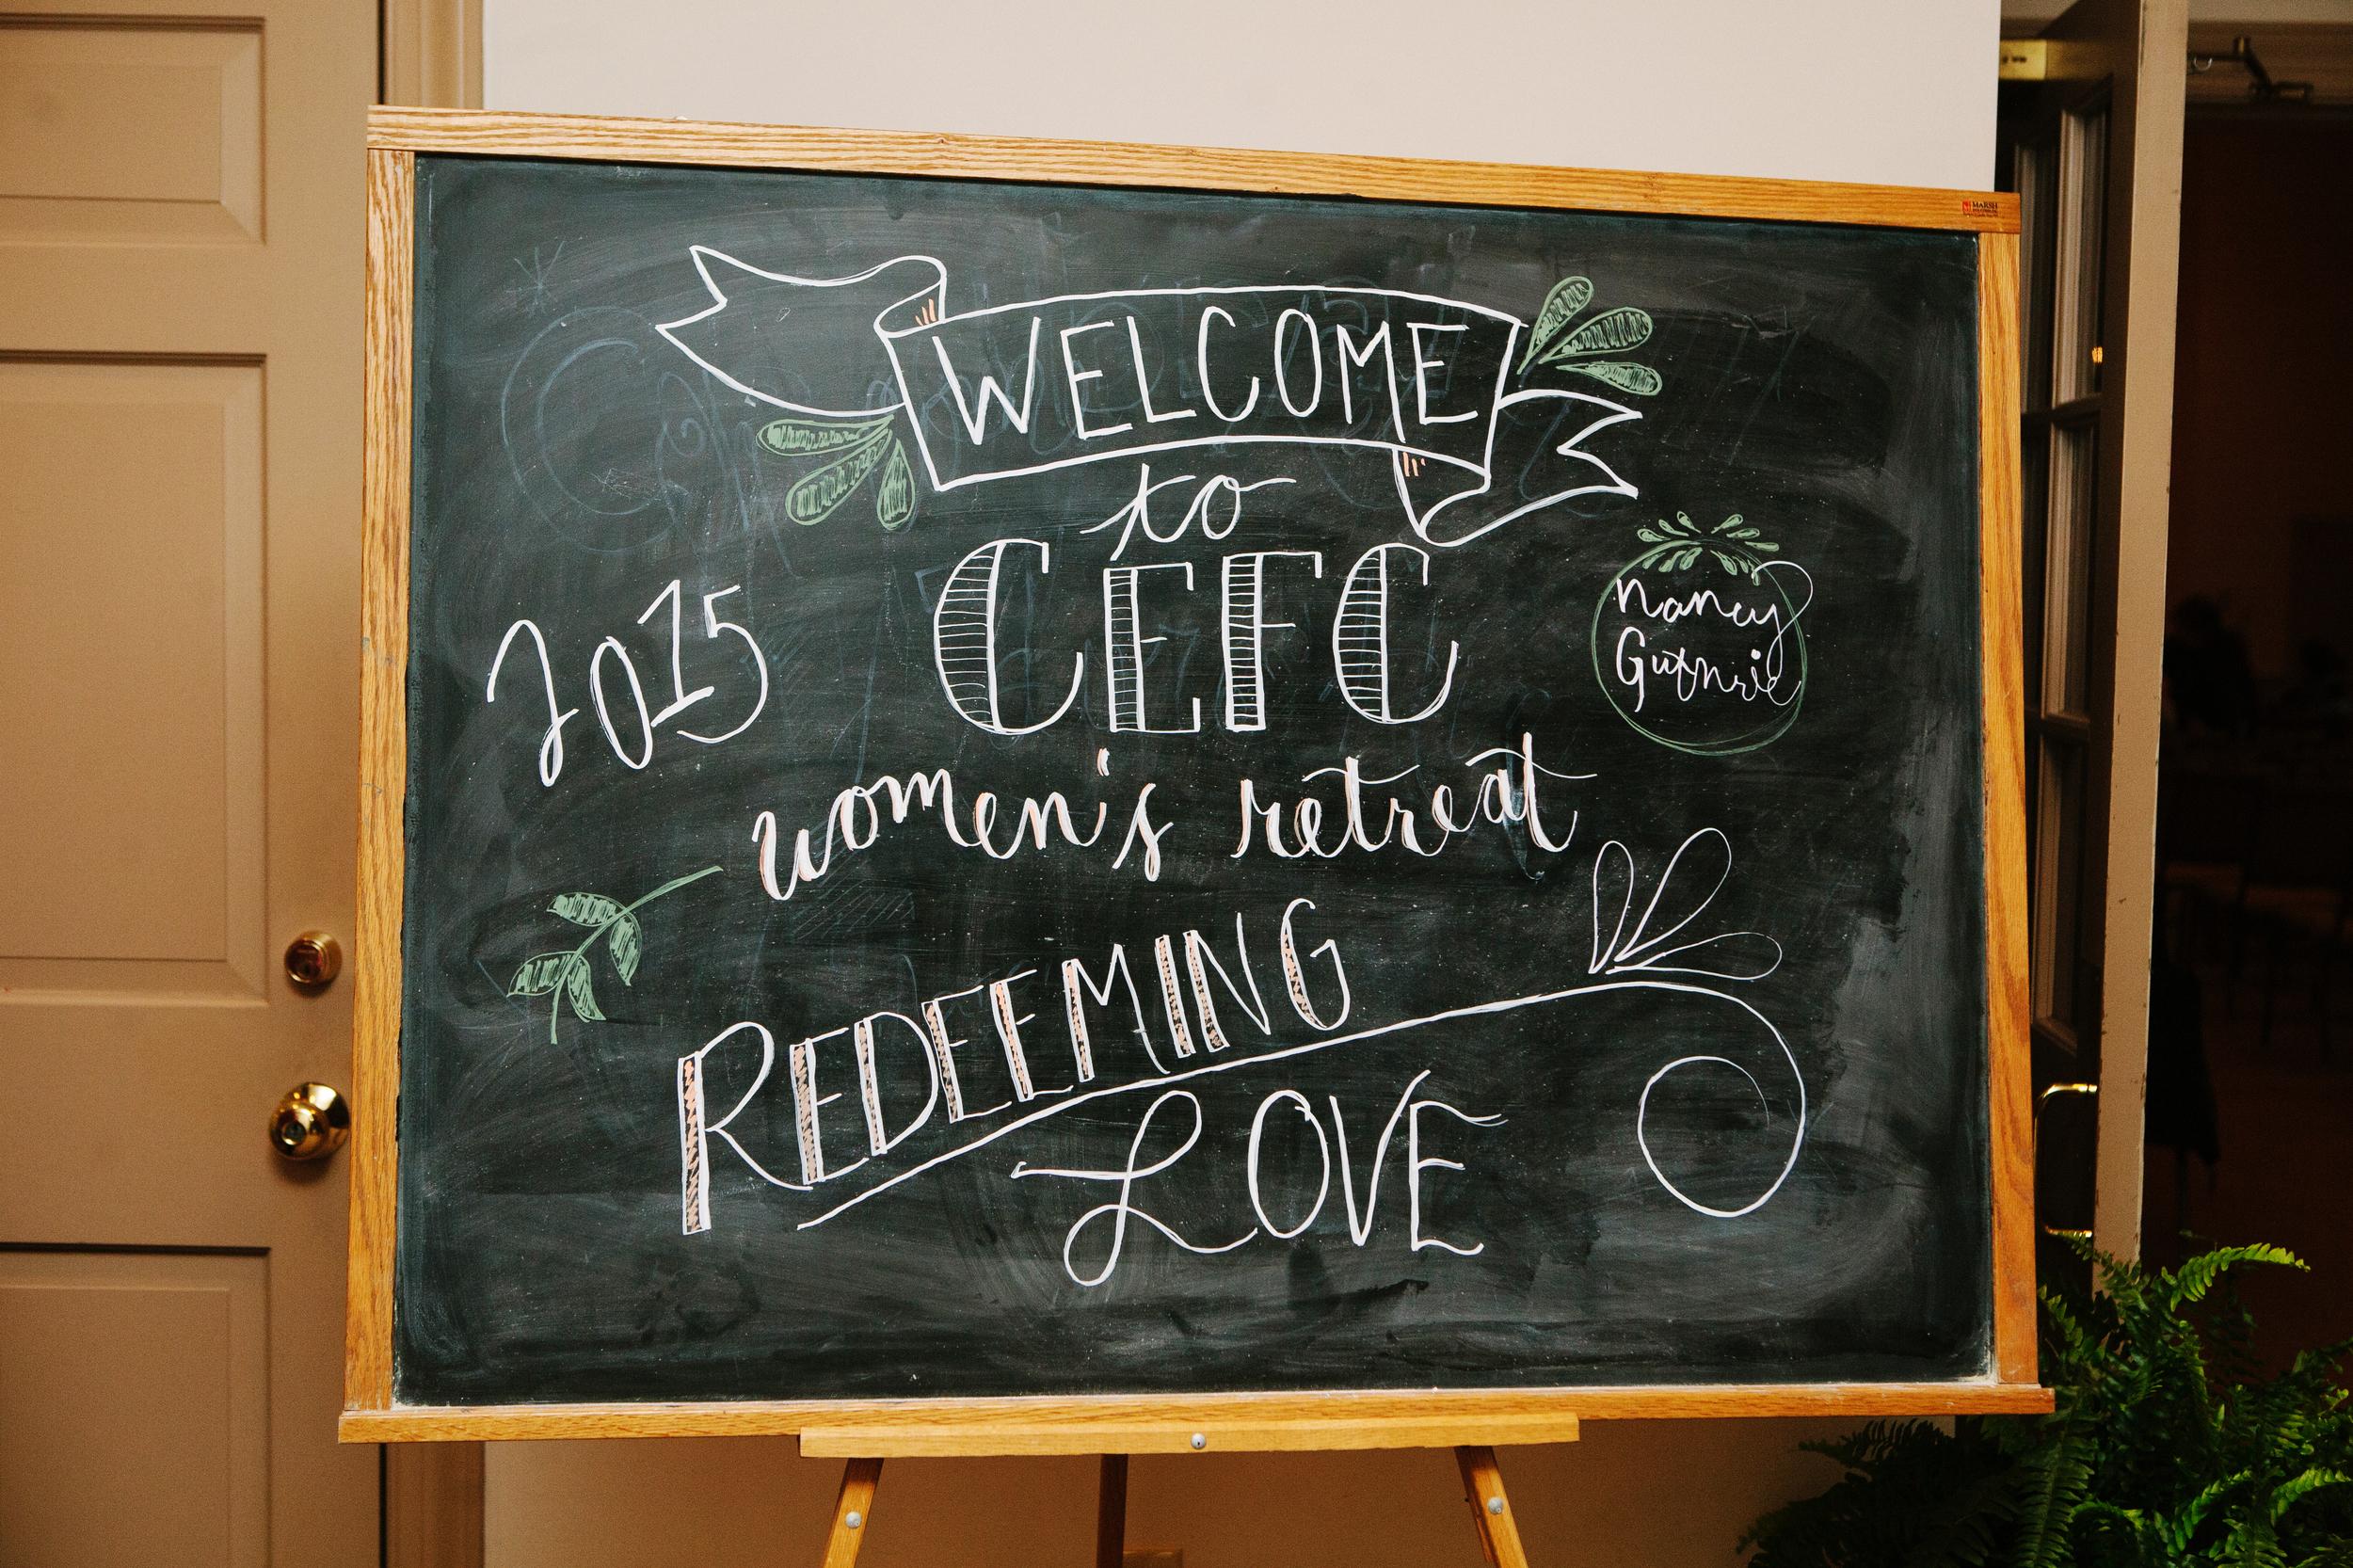 redeeming-love-cefc-womens-retreat-01.JPG